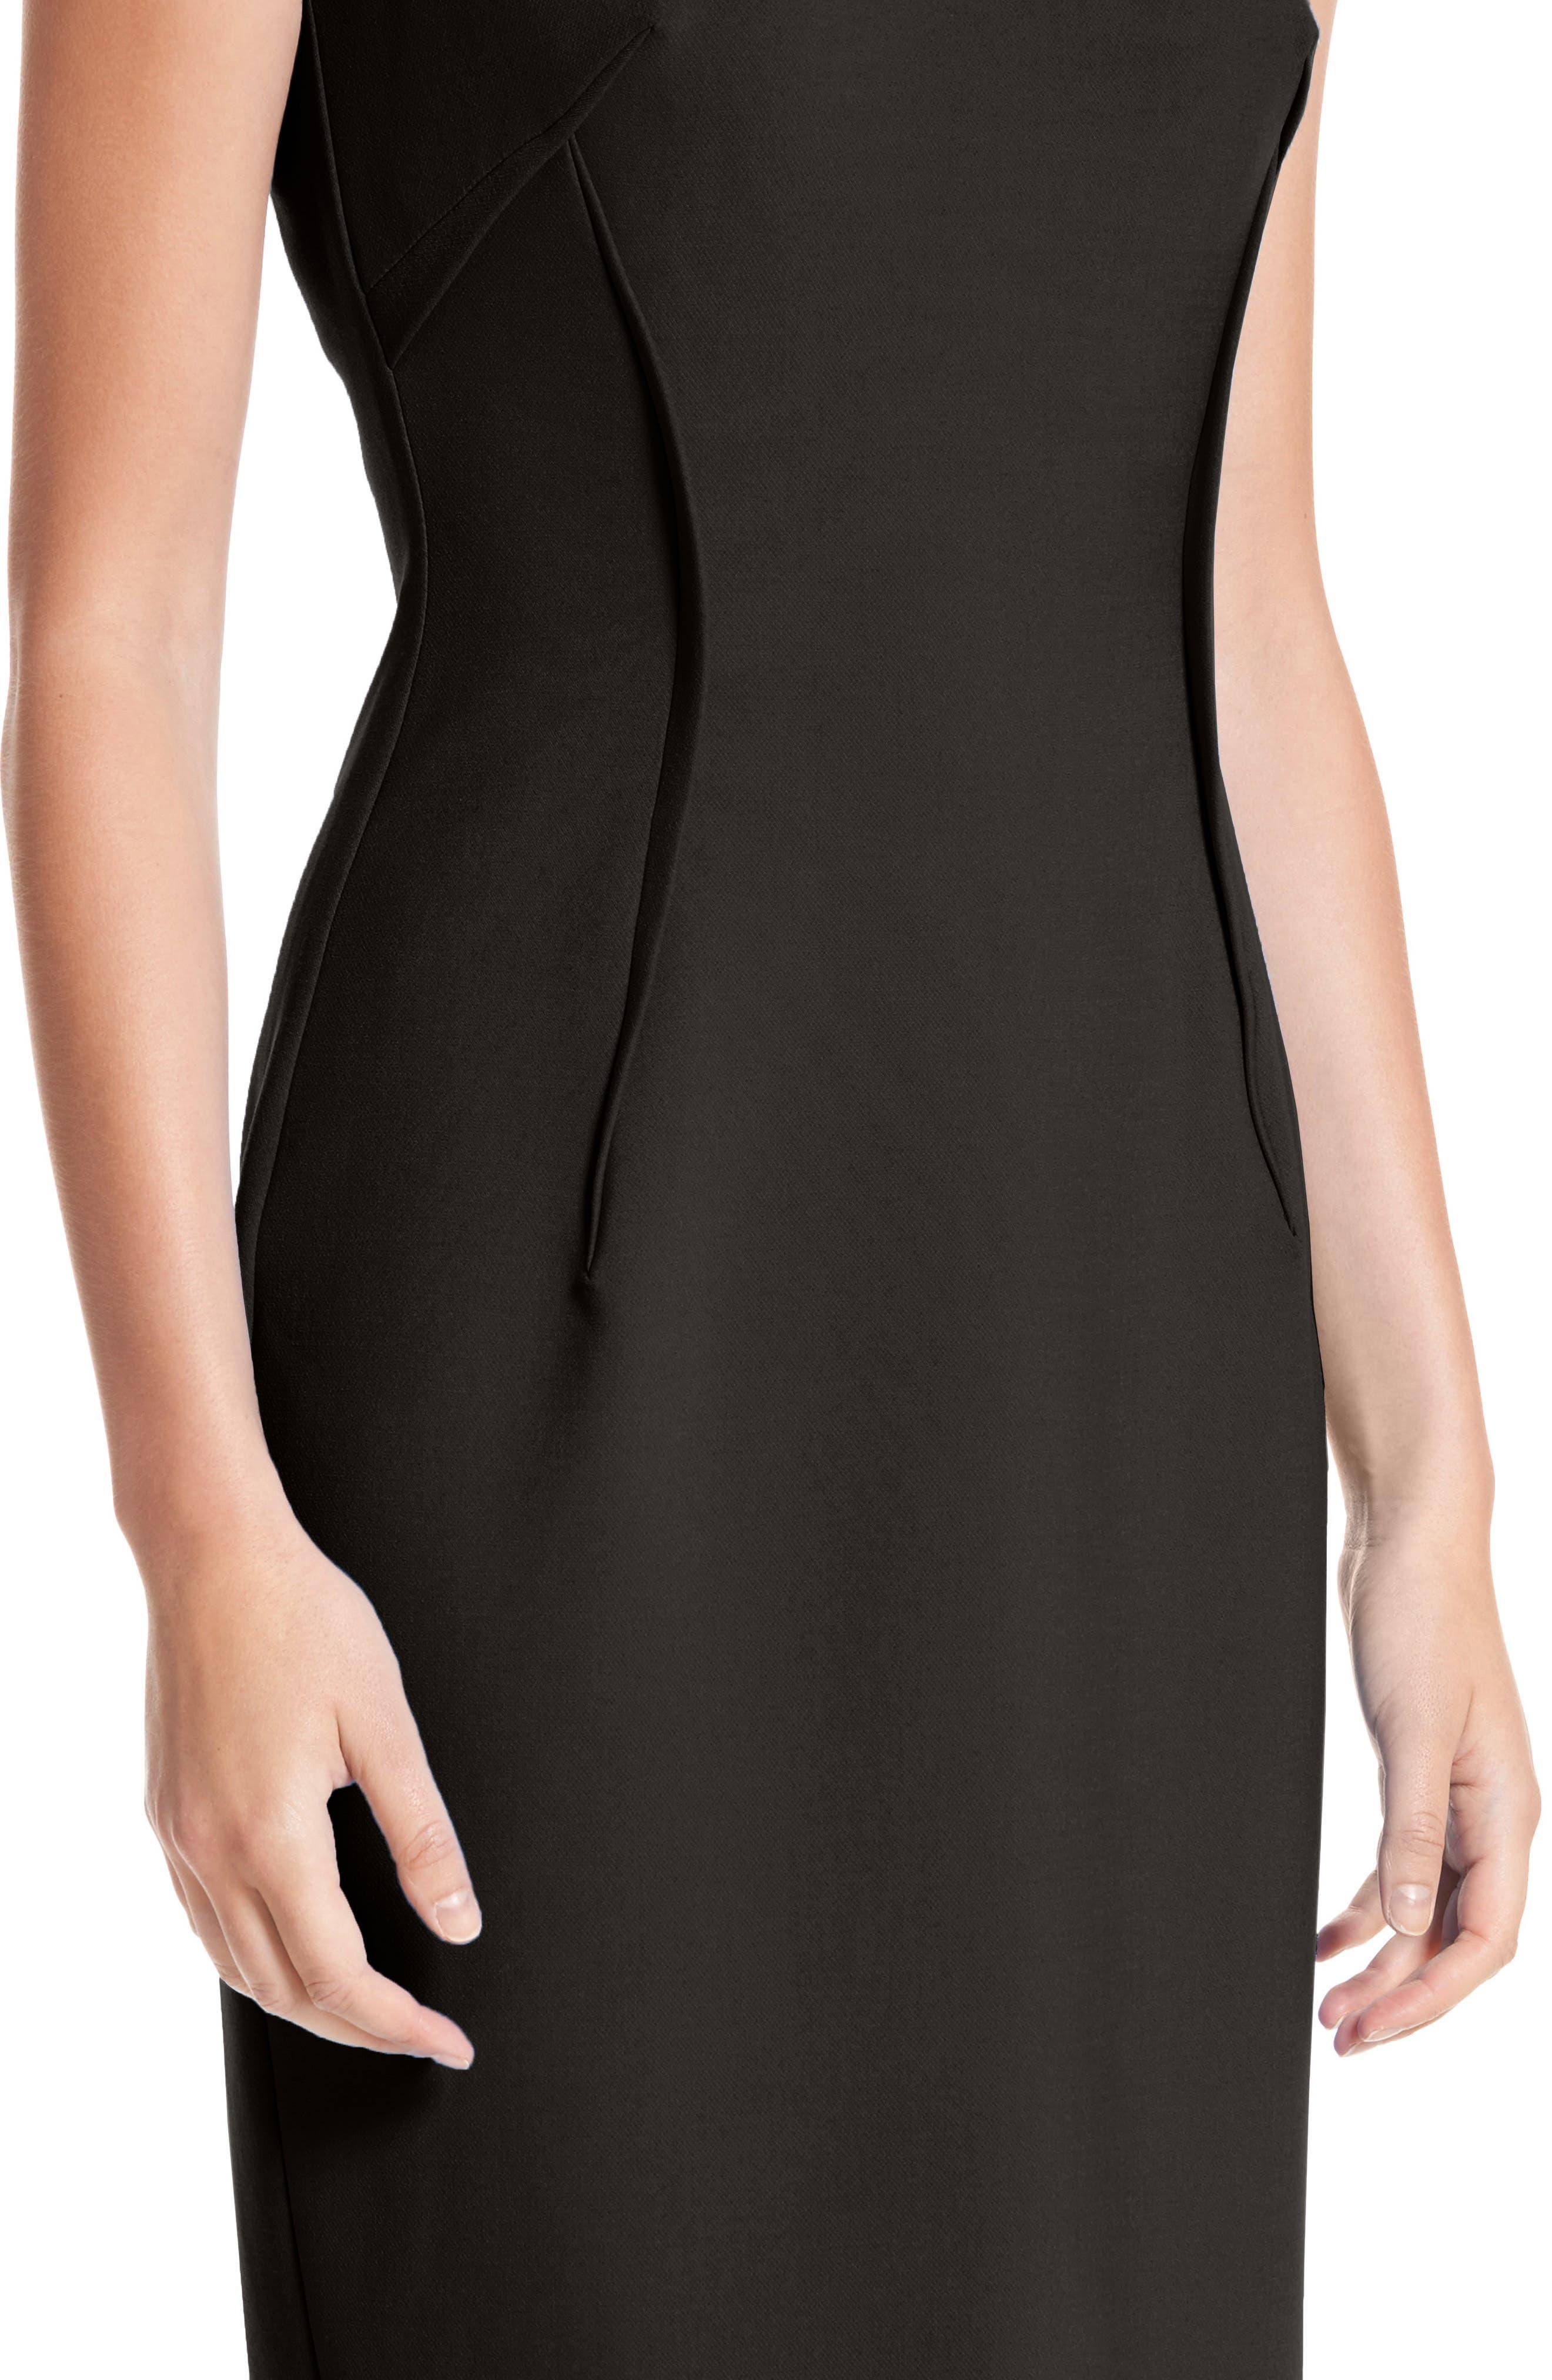 VERSACE COLLECTION, Stretch Cady Sheath Dress, Alternate thumbnail 4, color, BLACK